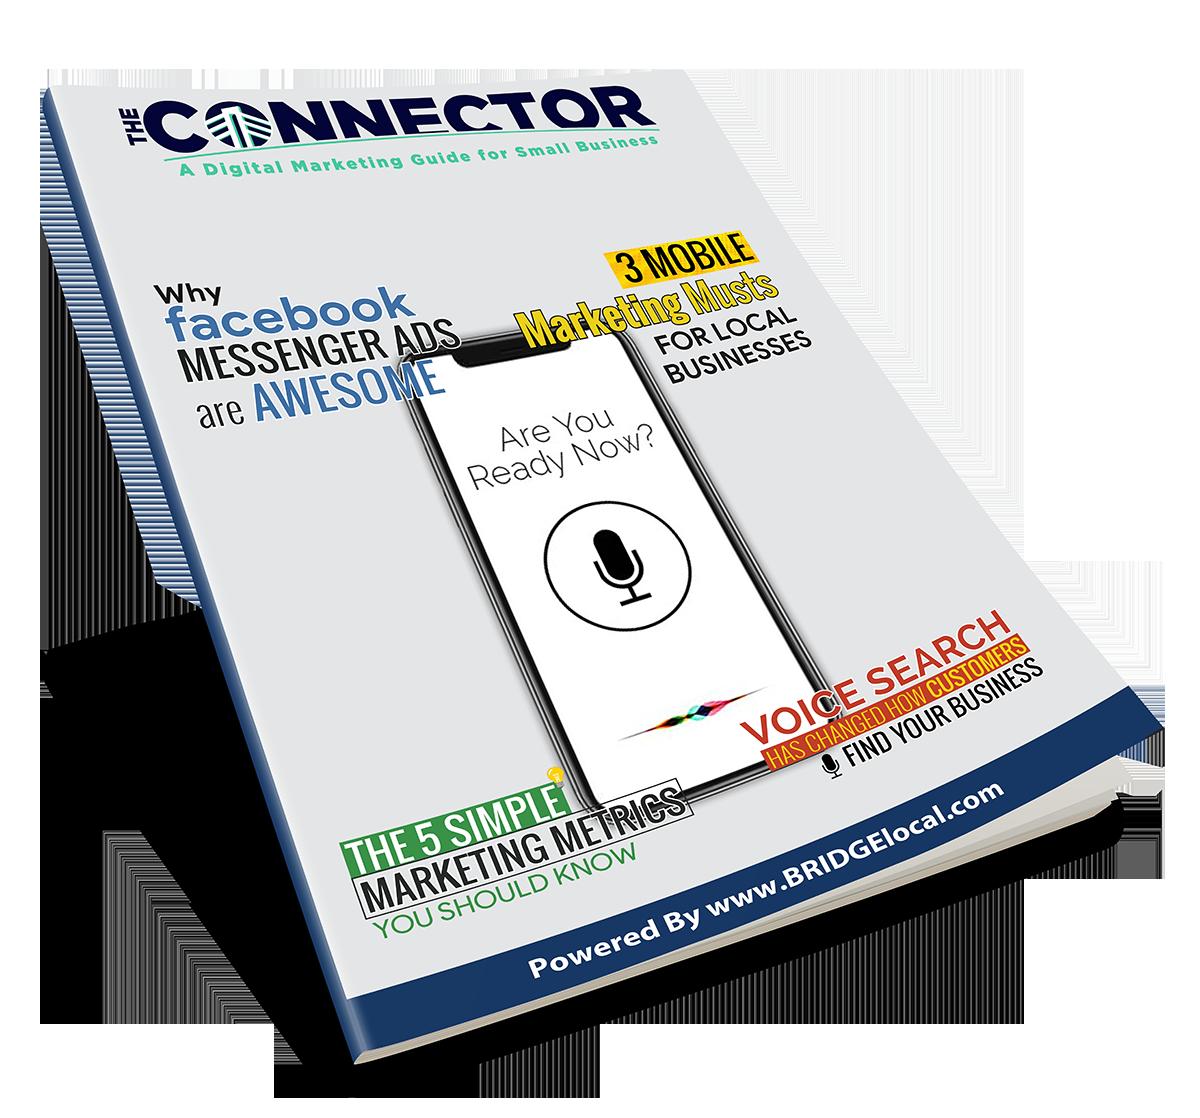 Connector-1556